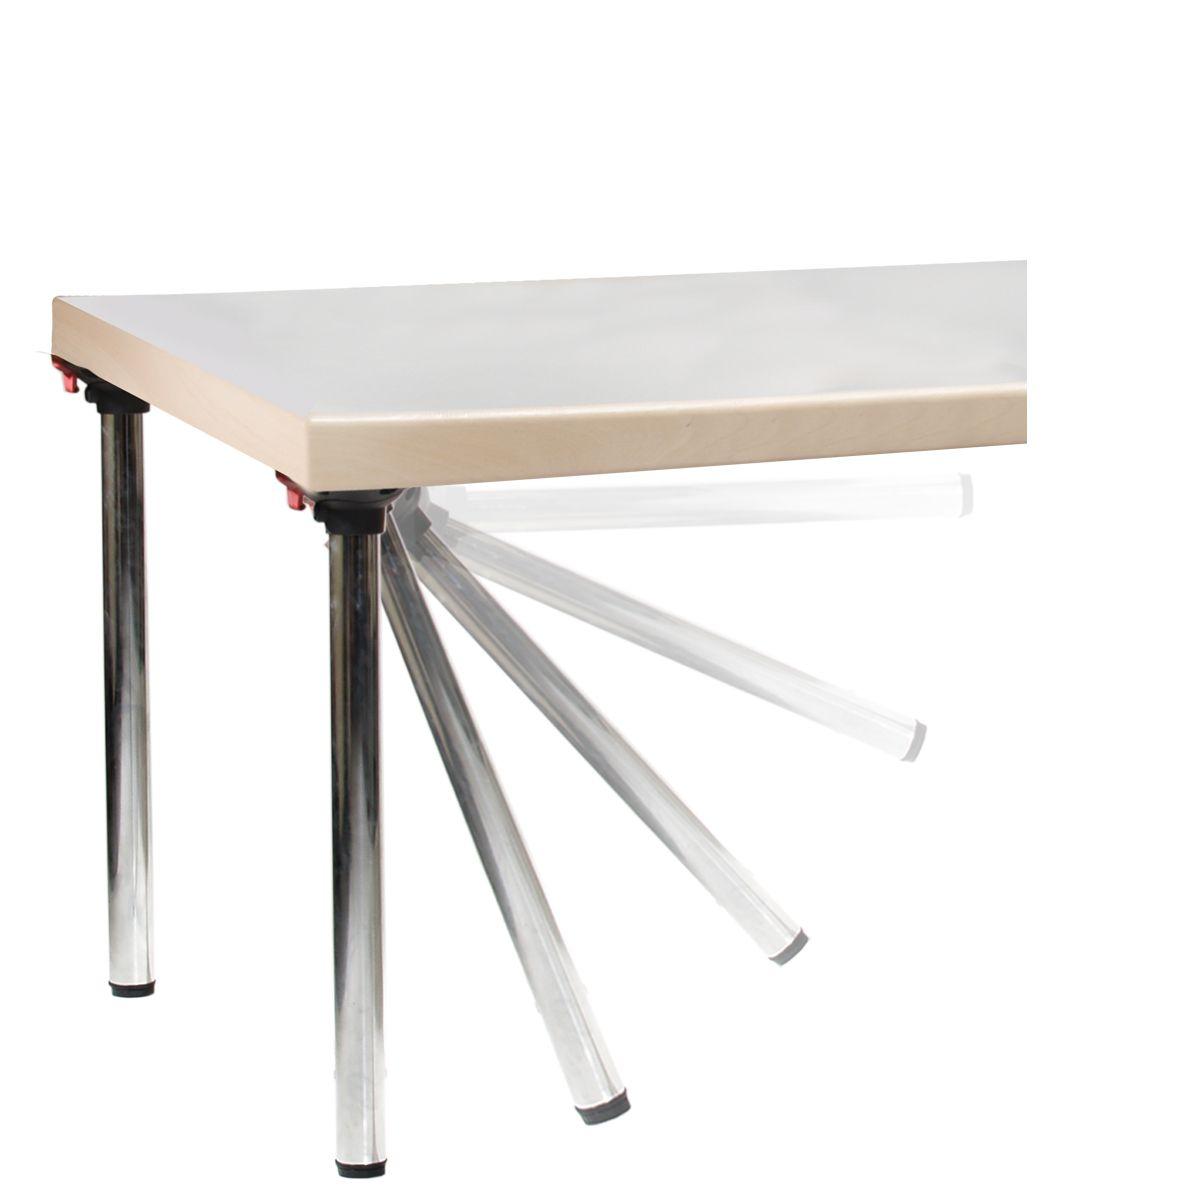 besprechungstisch seminartisch klapptisch meto solo cs. Black Bedroom Furniture Sets. Home Design Ideas